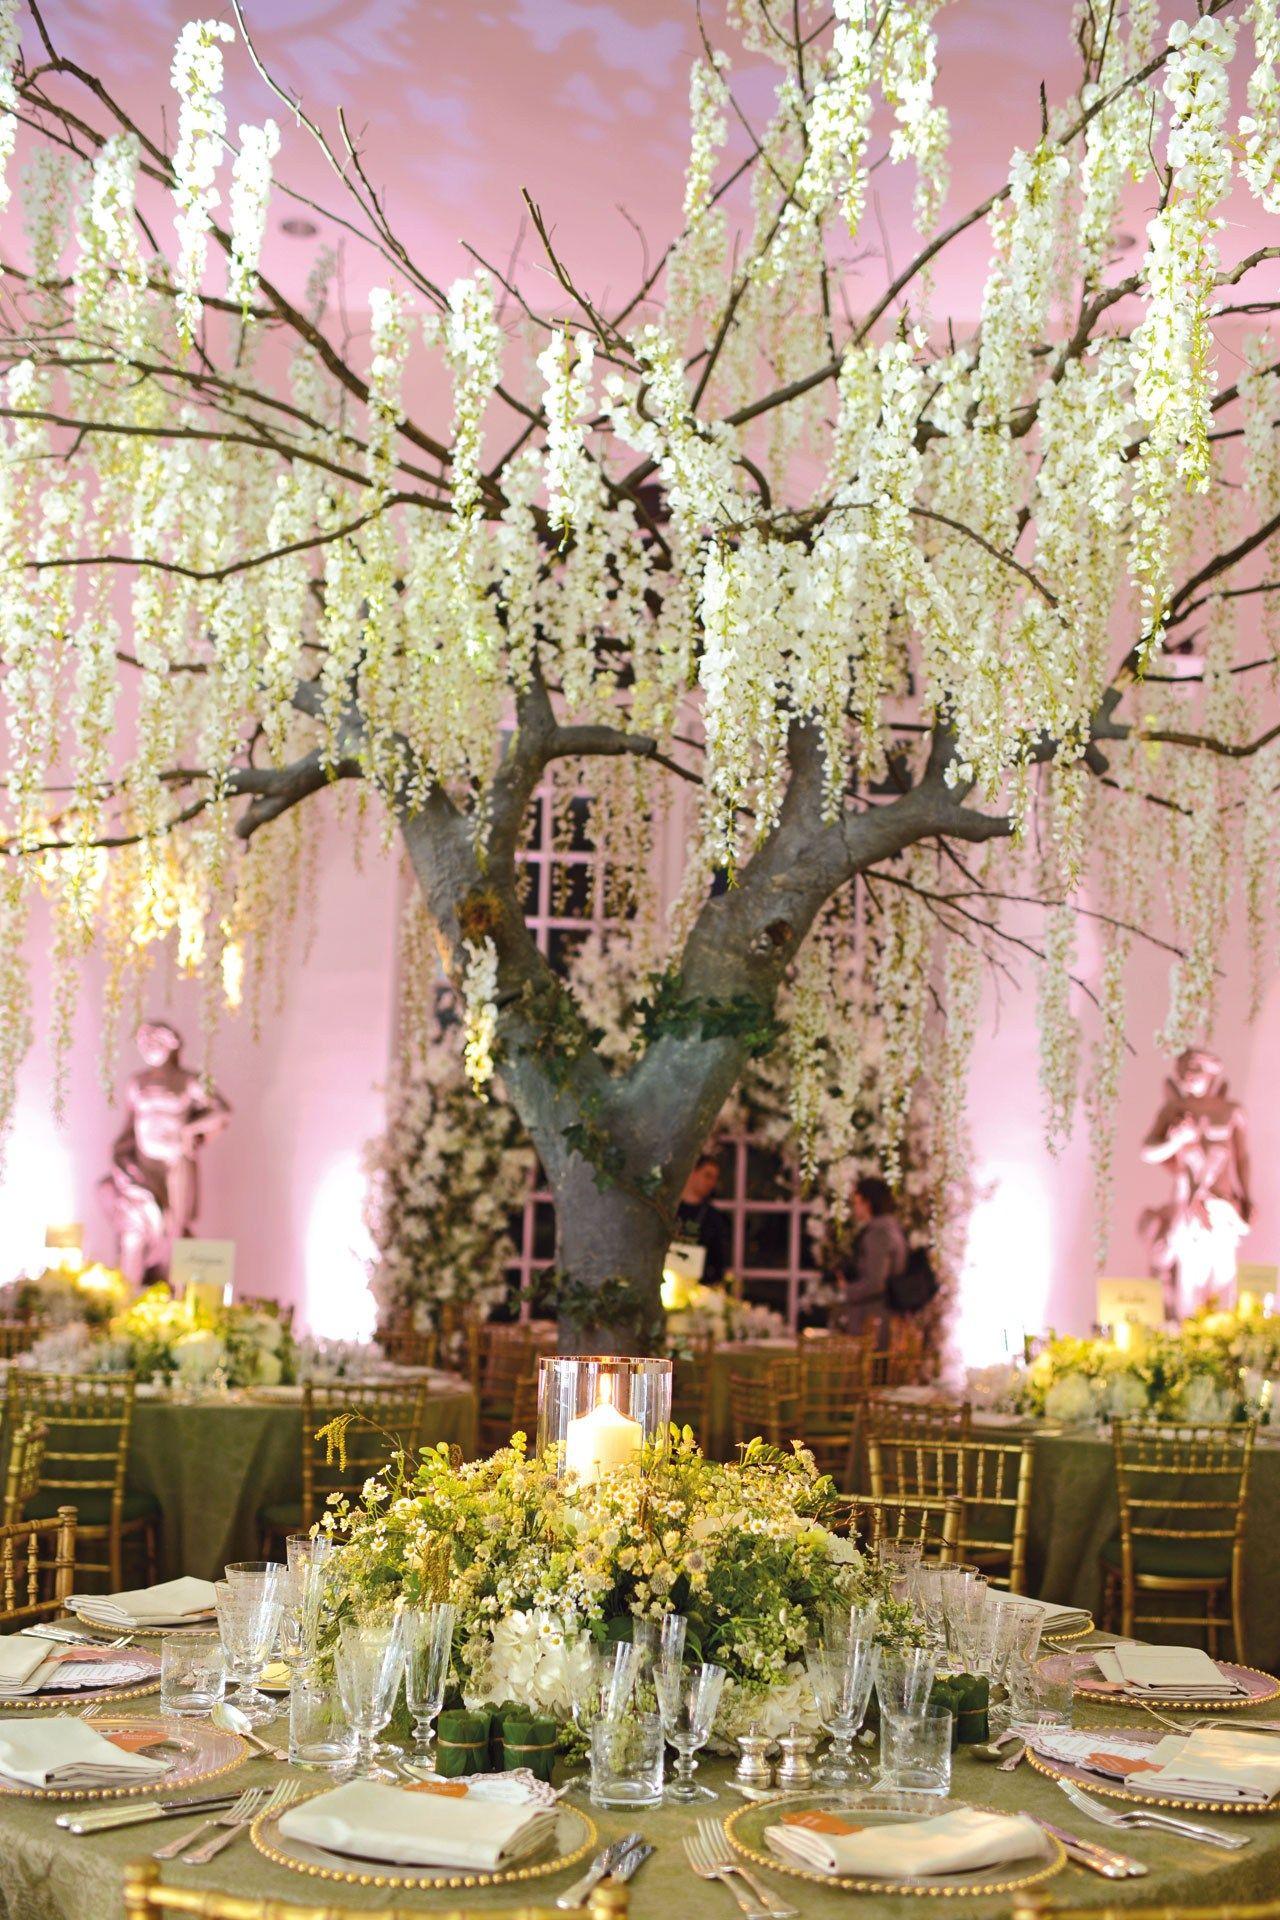 Enter The Enchanted Forest BridesMagazinecouk